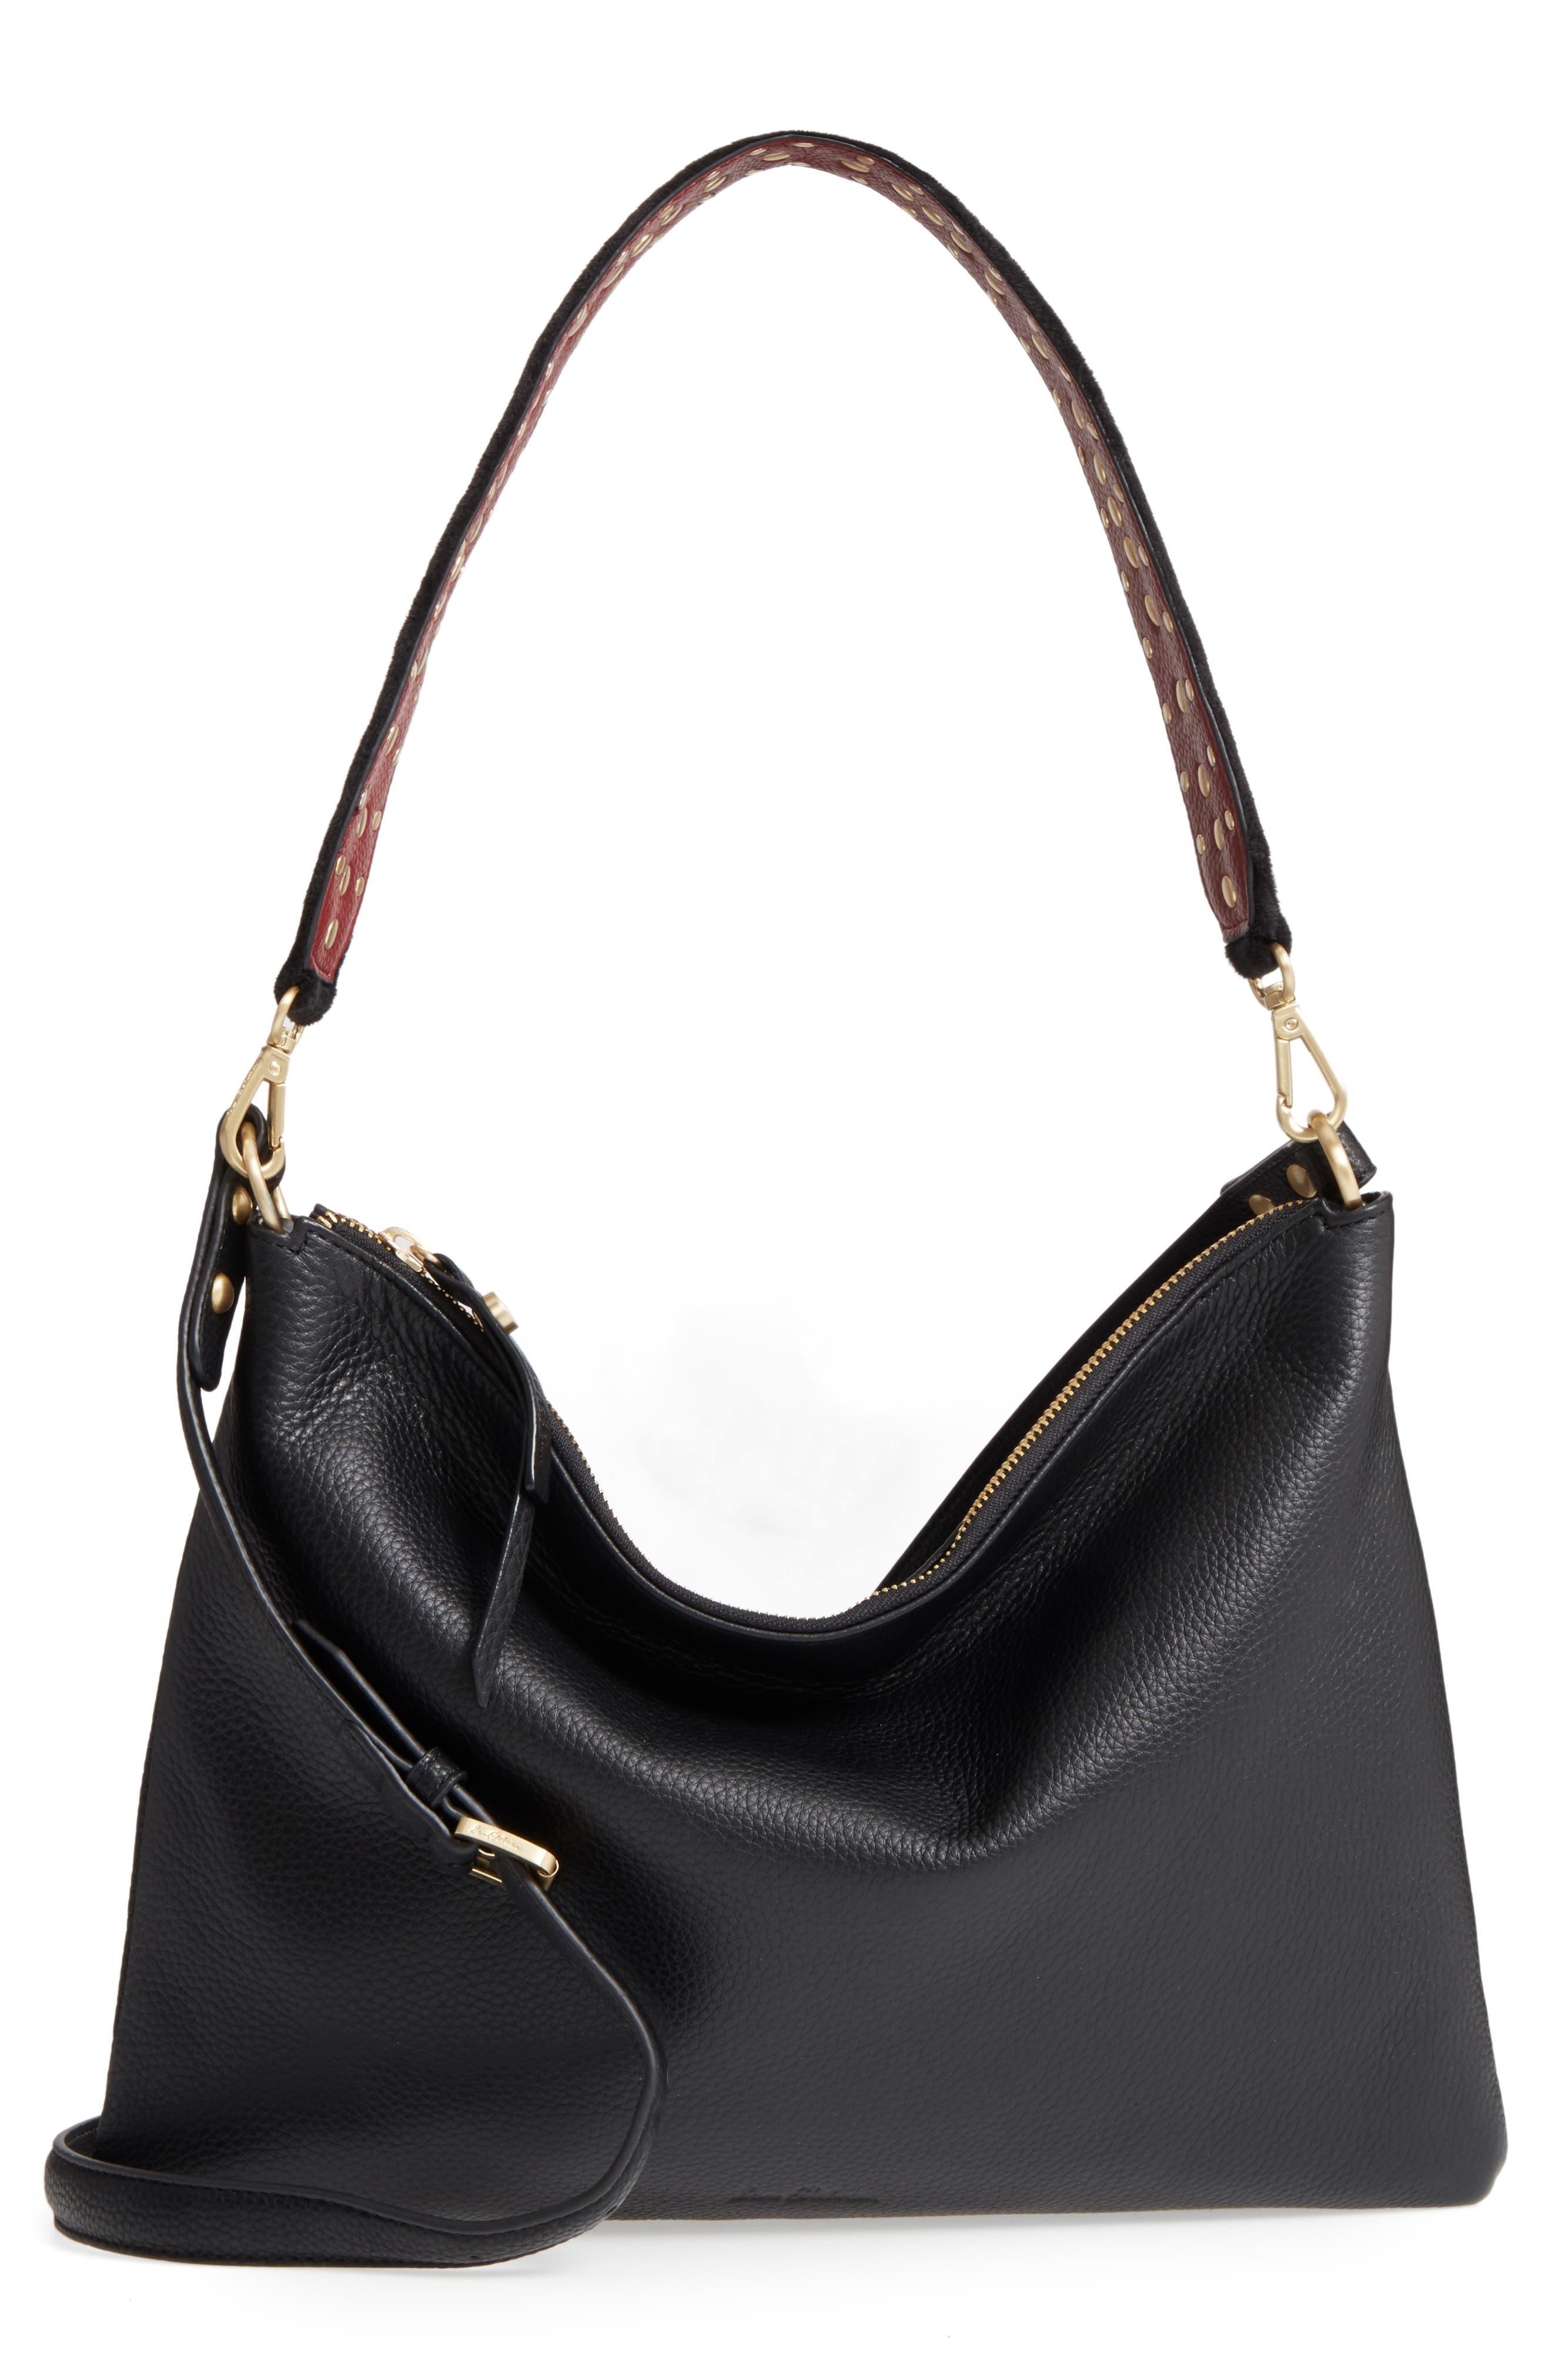 Raelyn Leather Shoulder Bag,                             Main thumbnail 1, color,                             001